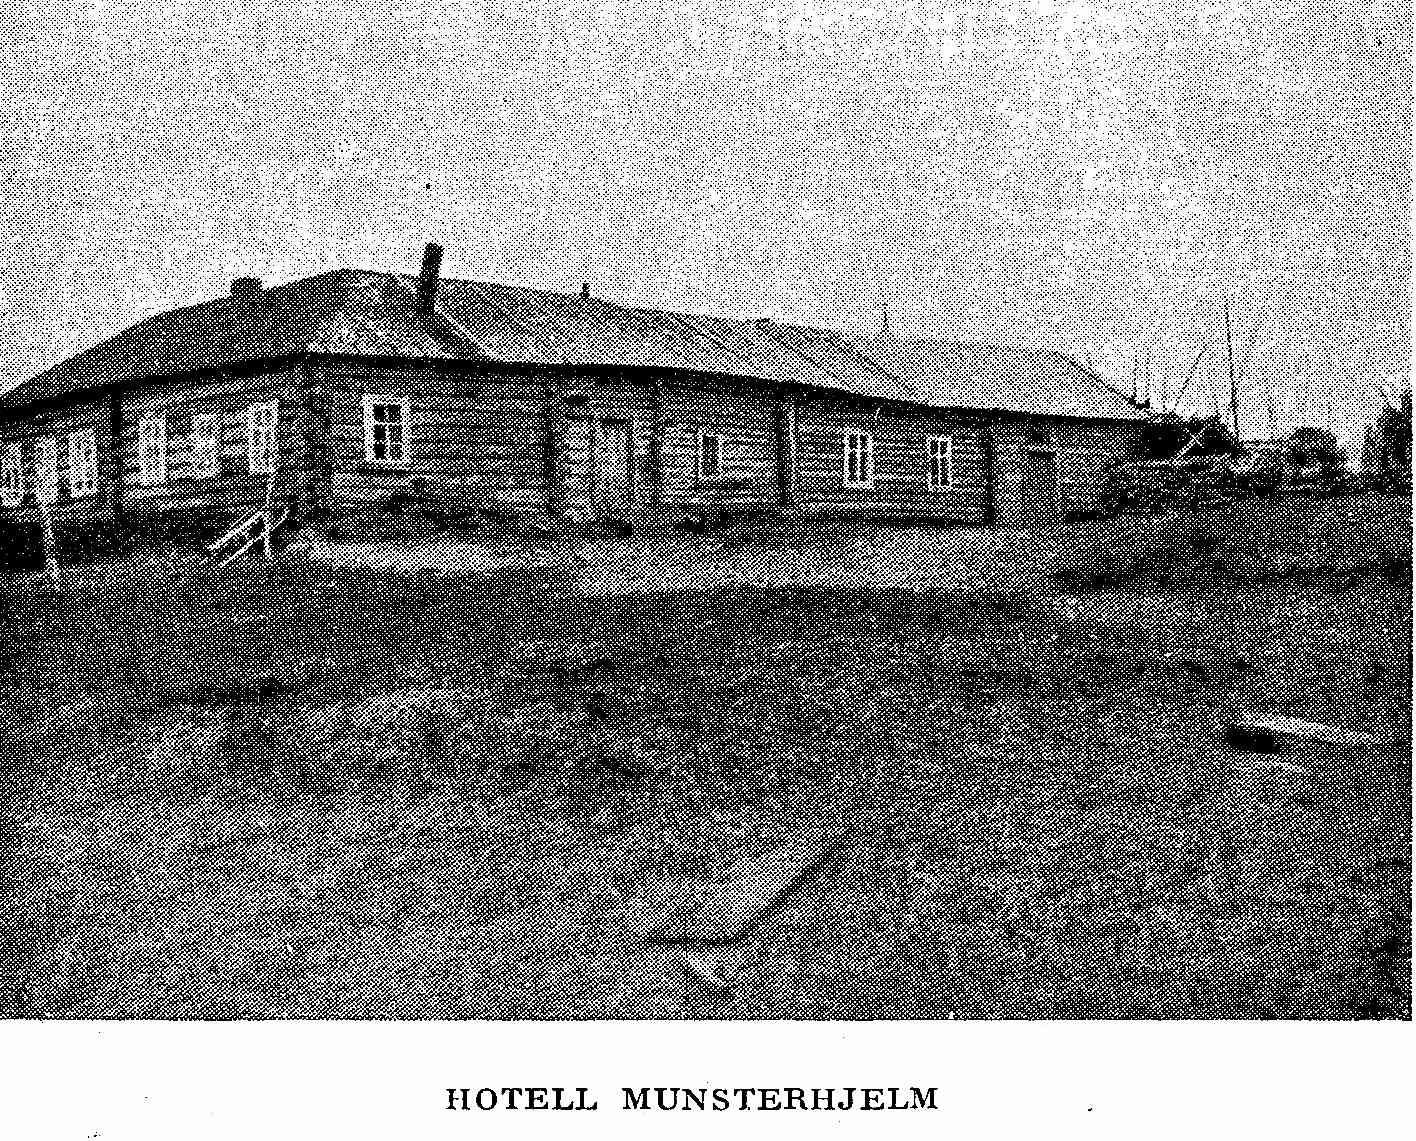 Hotelli Munsterhjelm Petsamo 1923